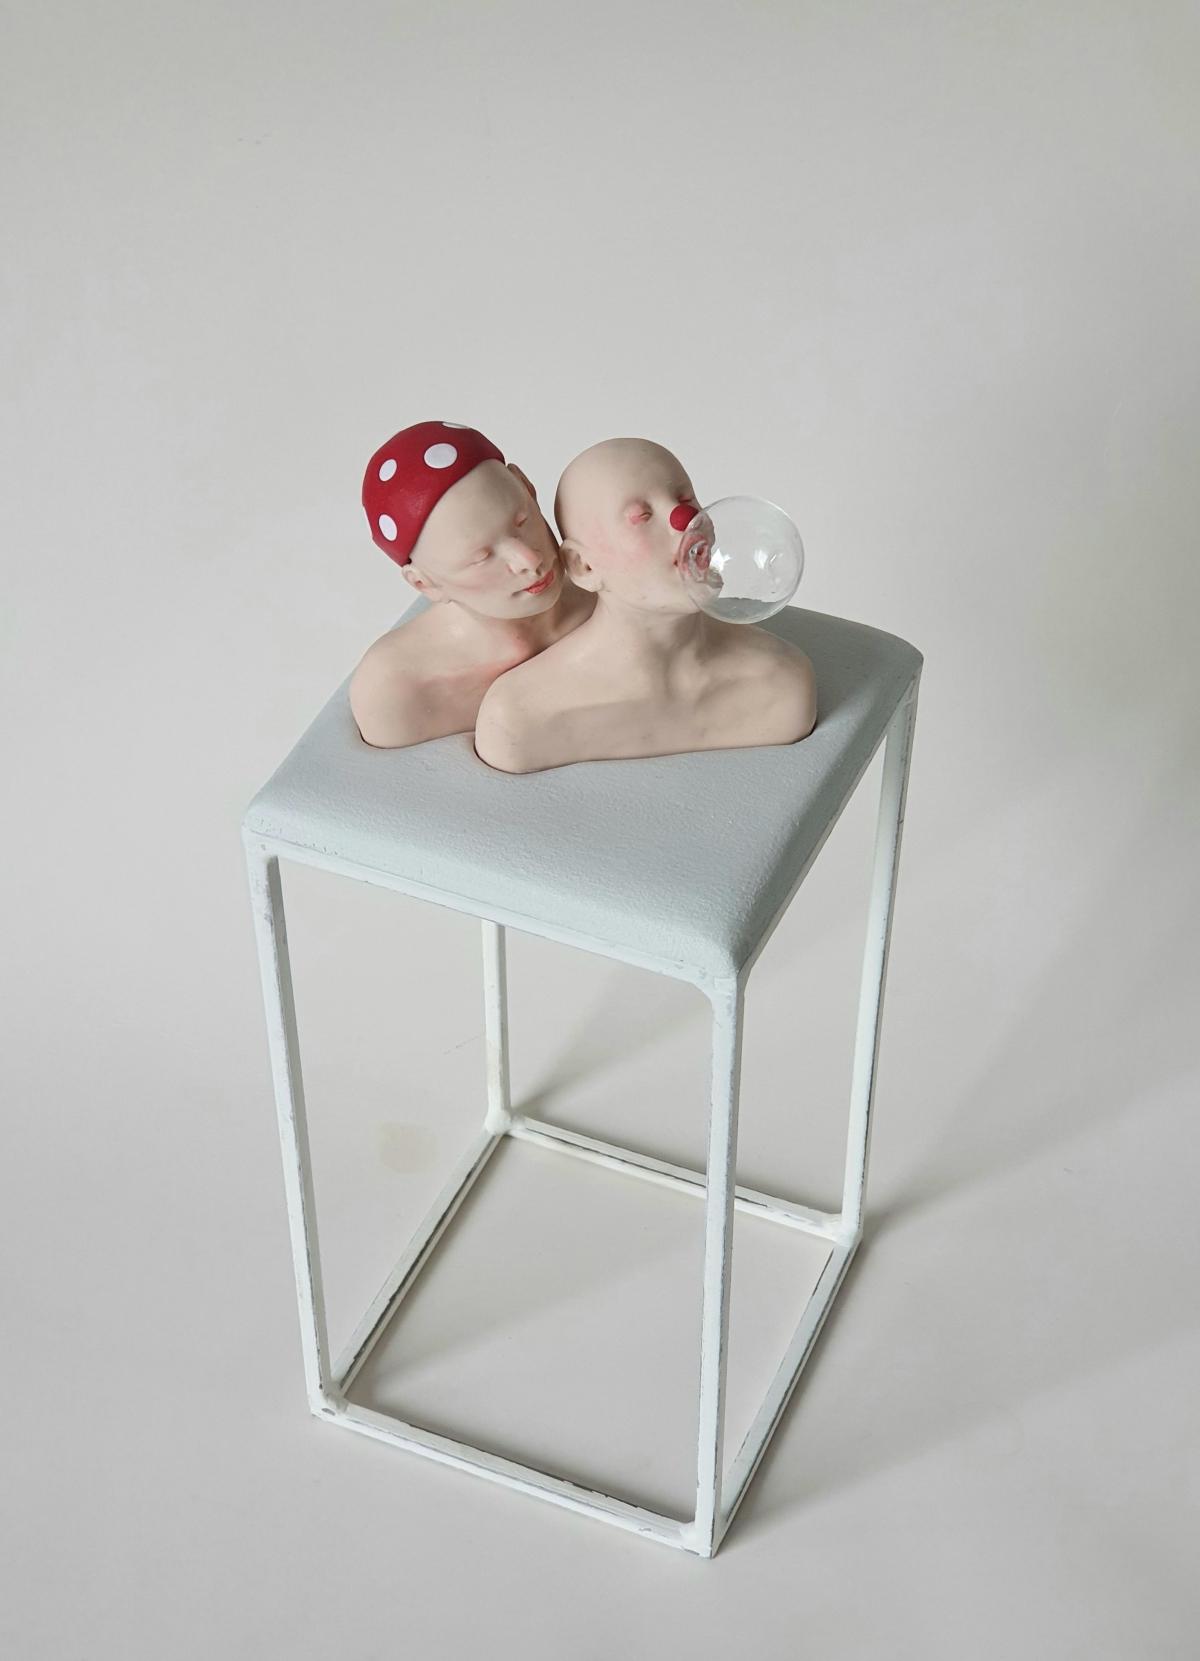 Kunst: clowns van kunstenaar Saskia Hoeboer